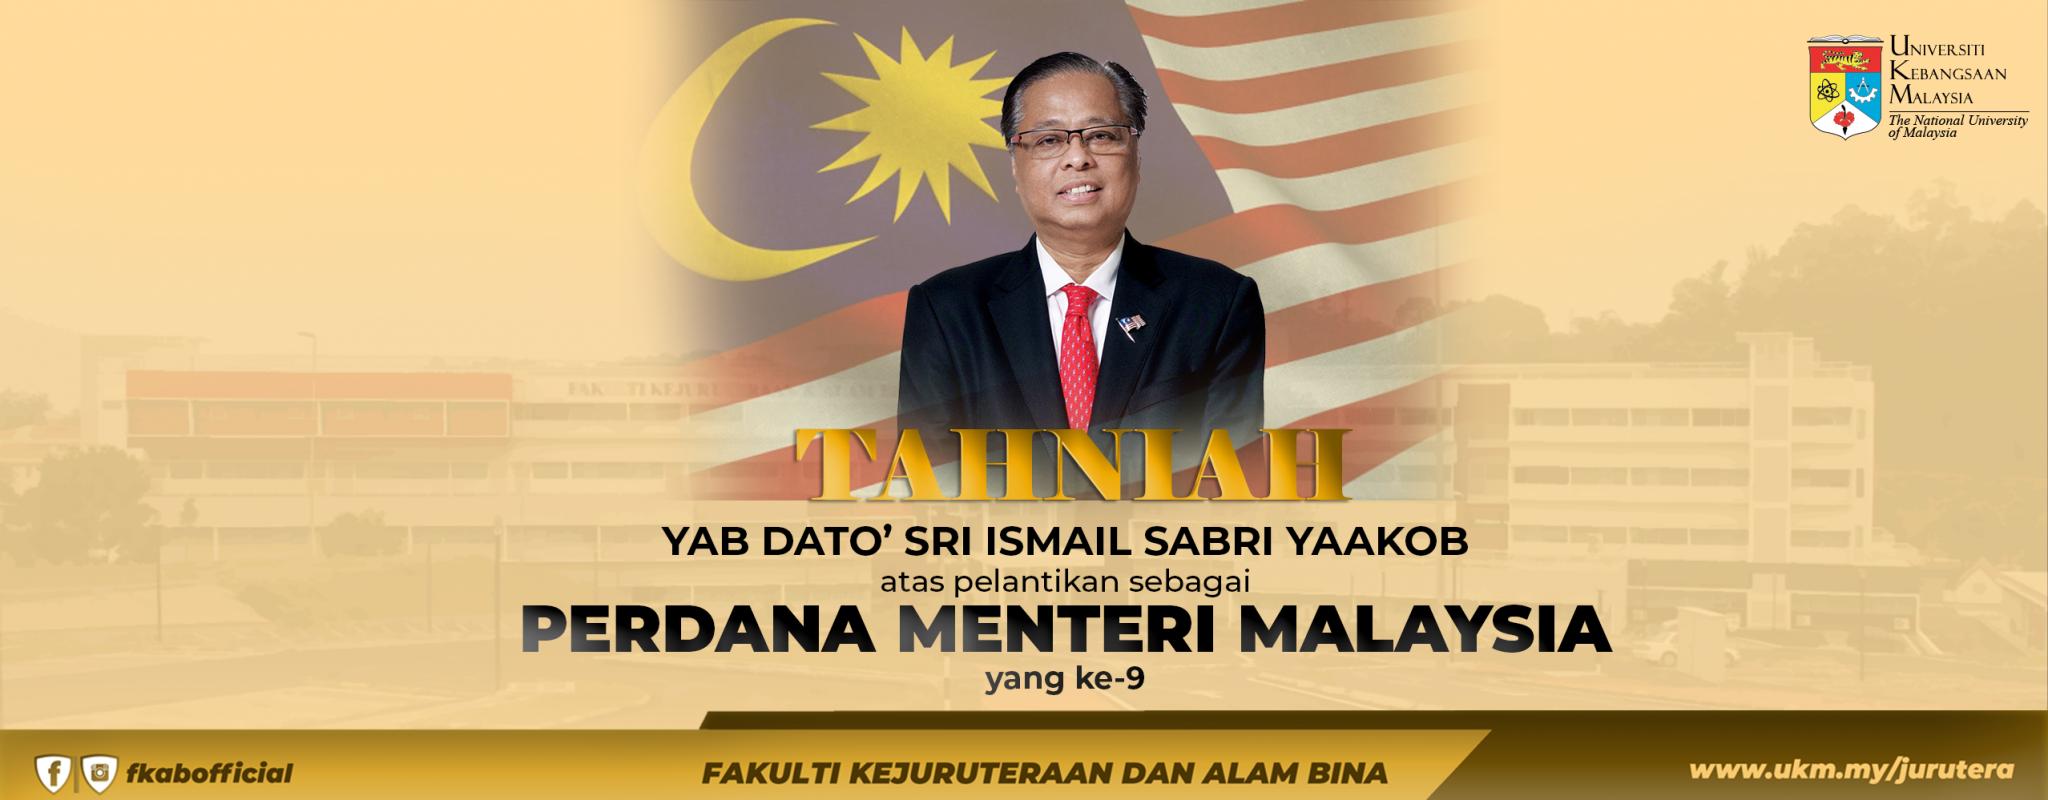 banner web BM PM9